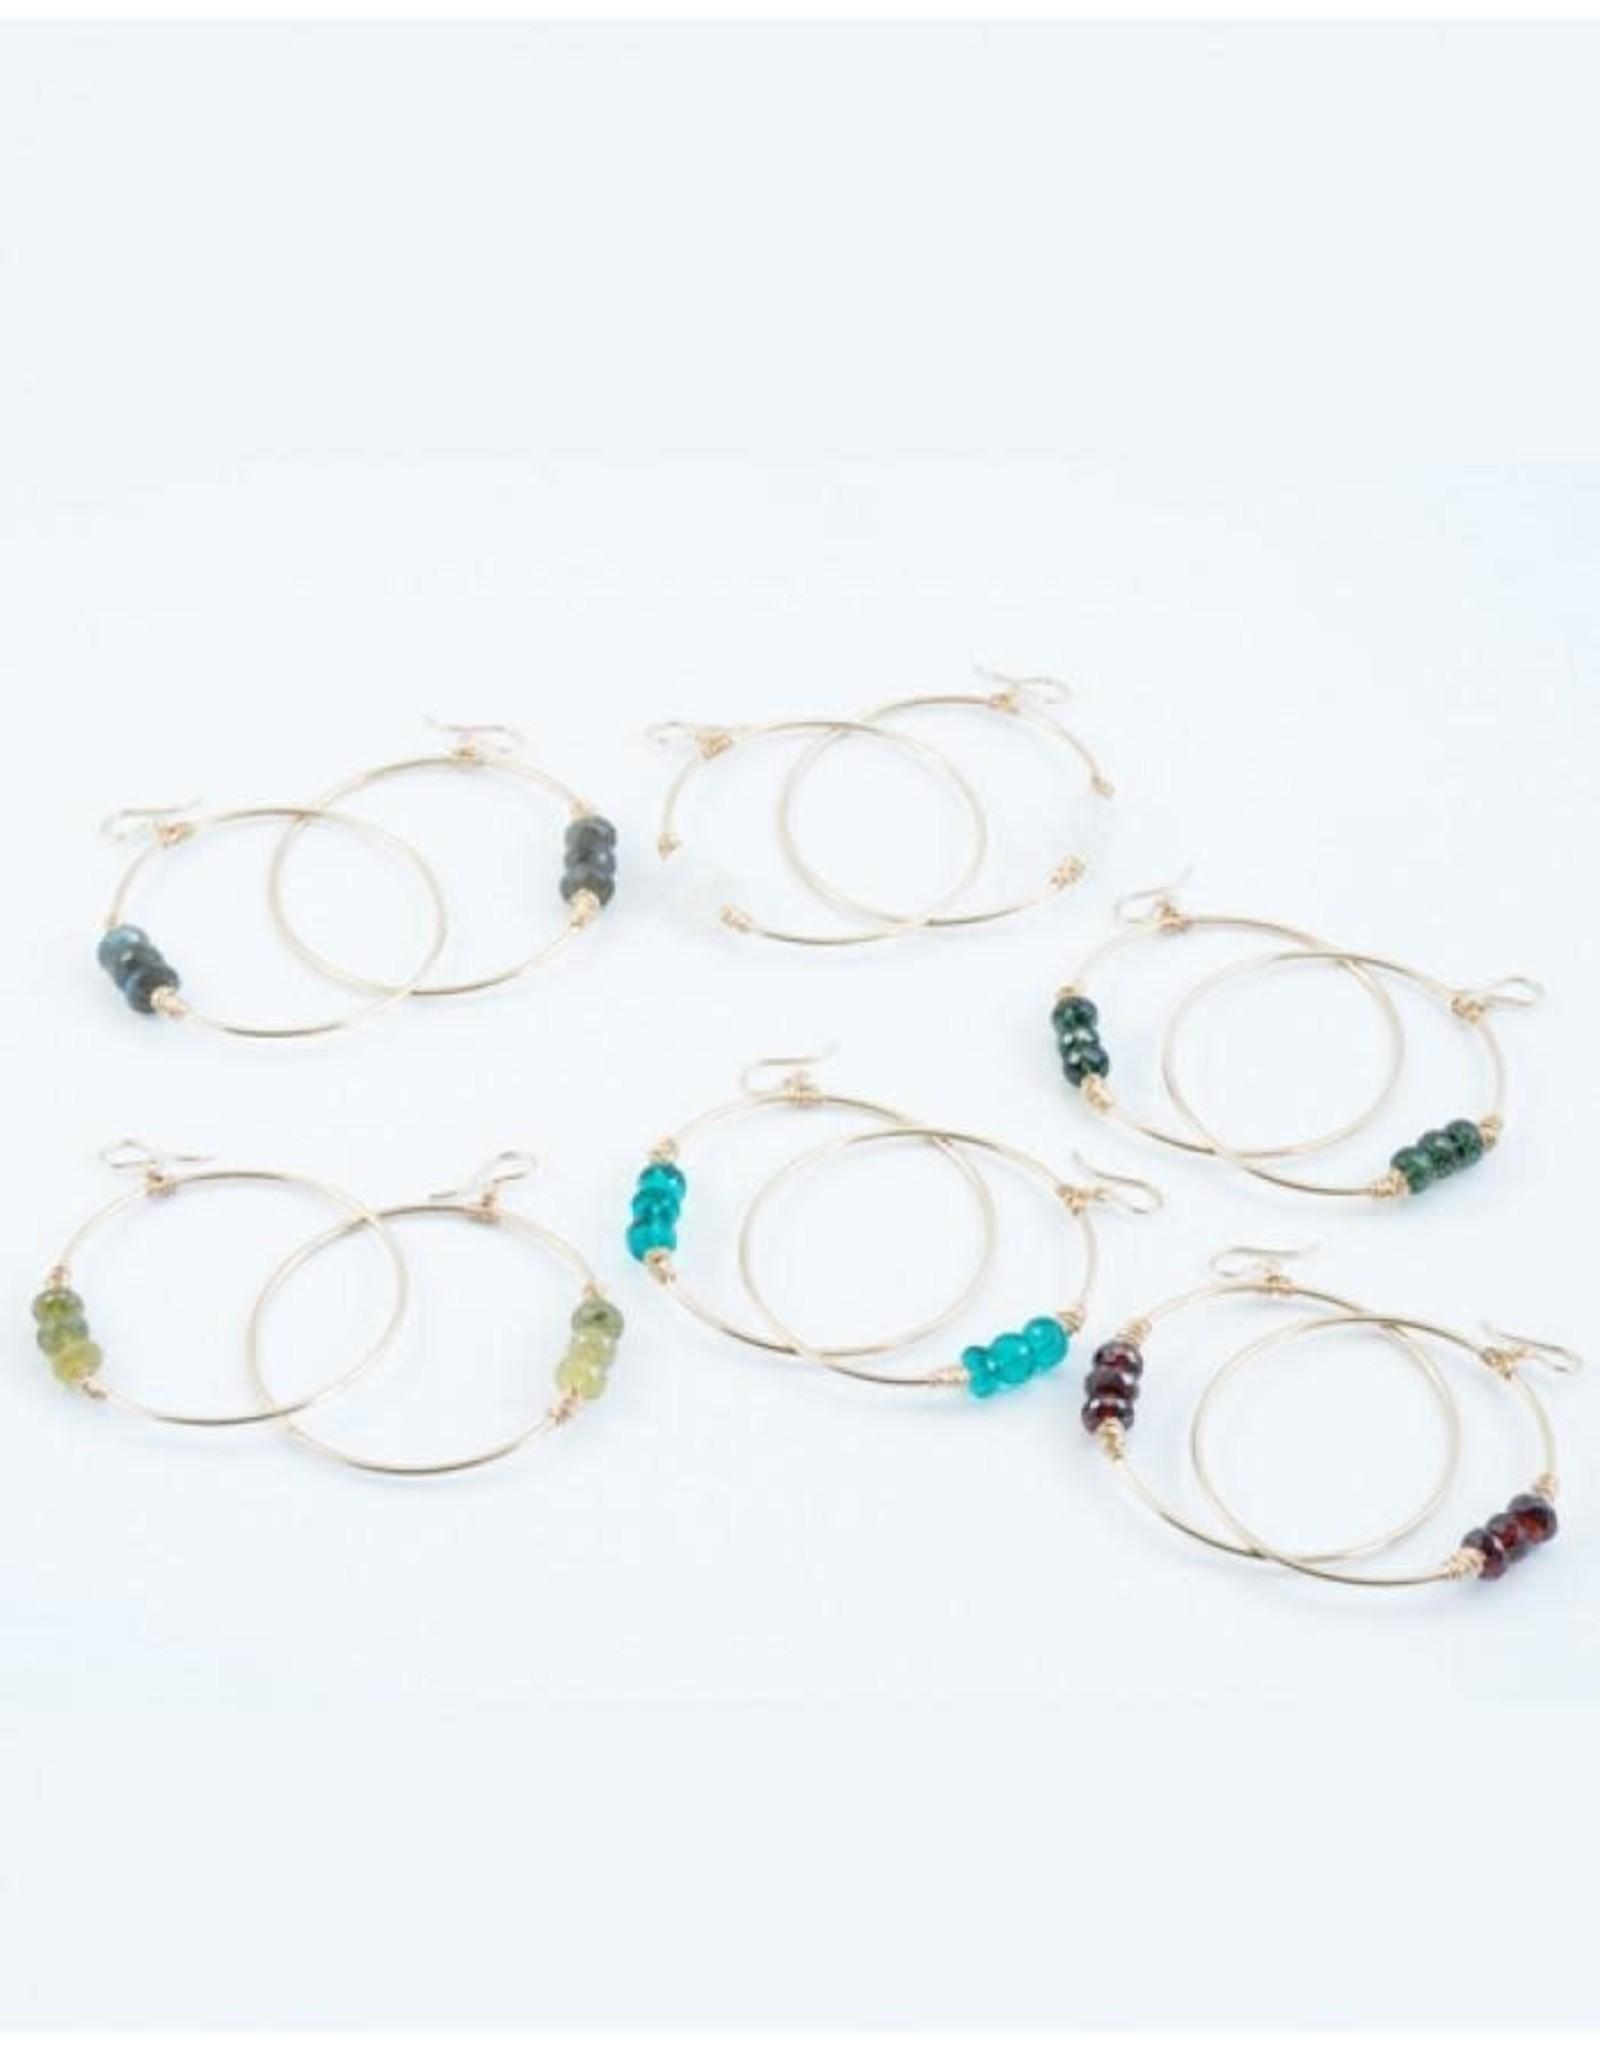 Heaven Hoop Earrings- Silver with Amethyst